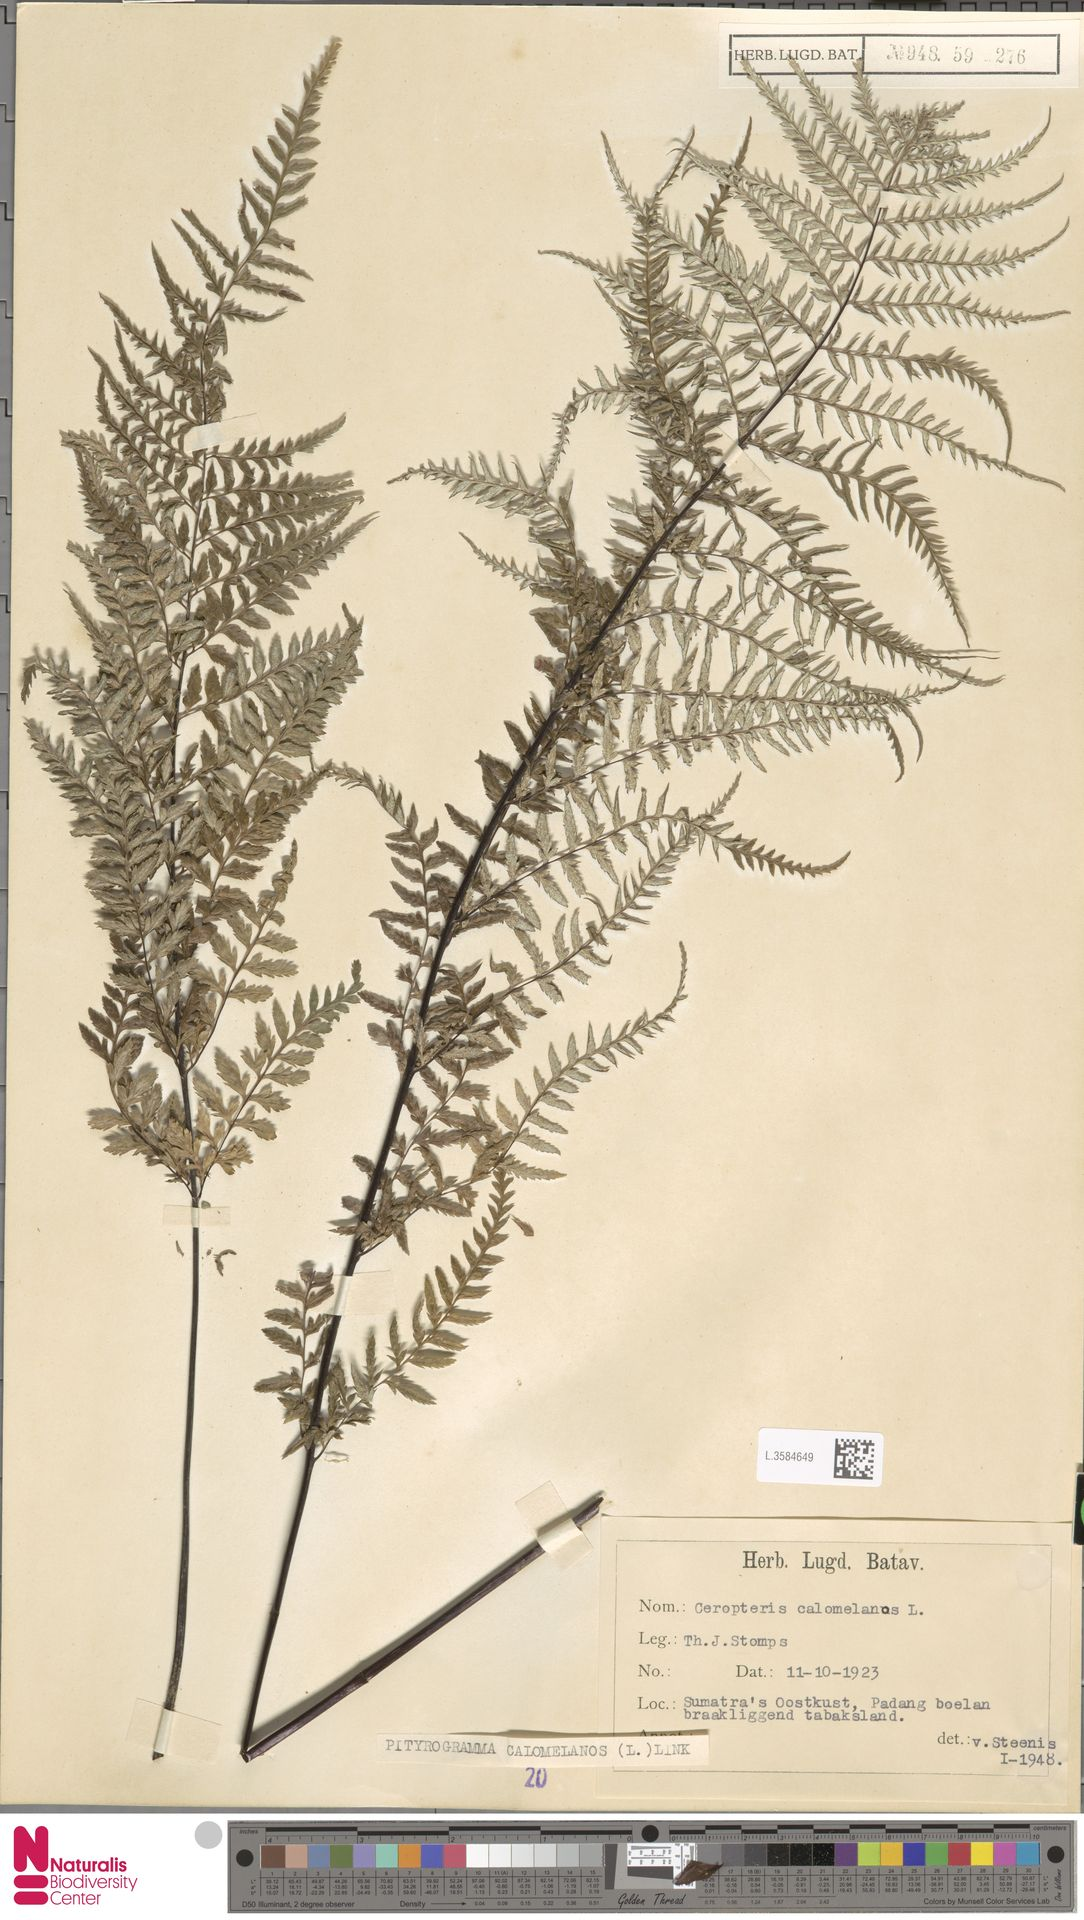 L.3584649   Pityrogramma calomelanos (L.) Link